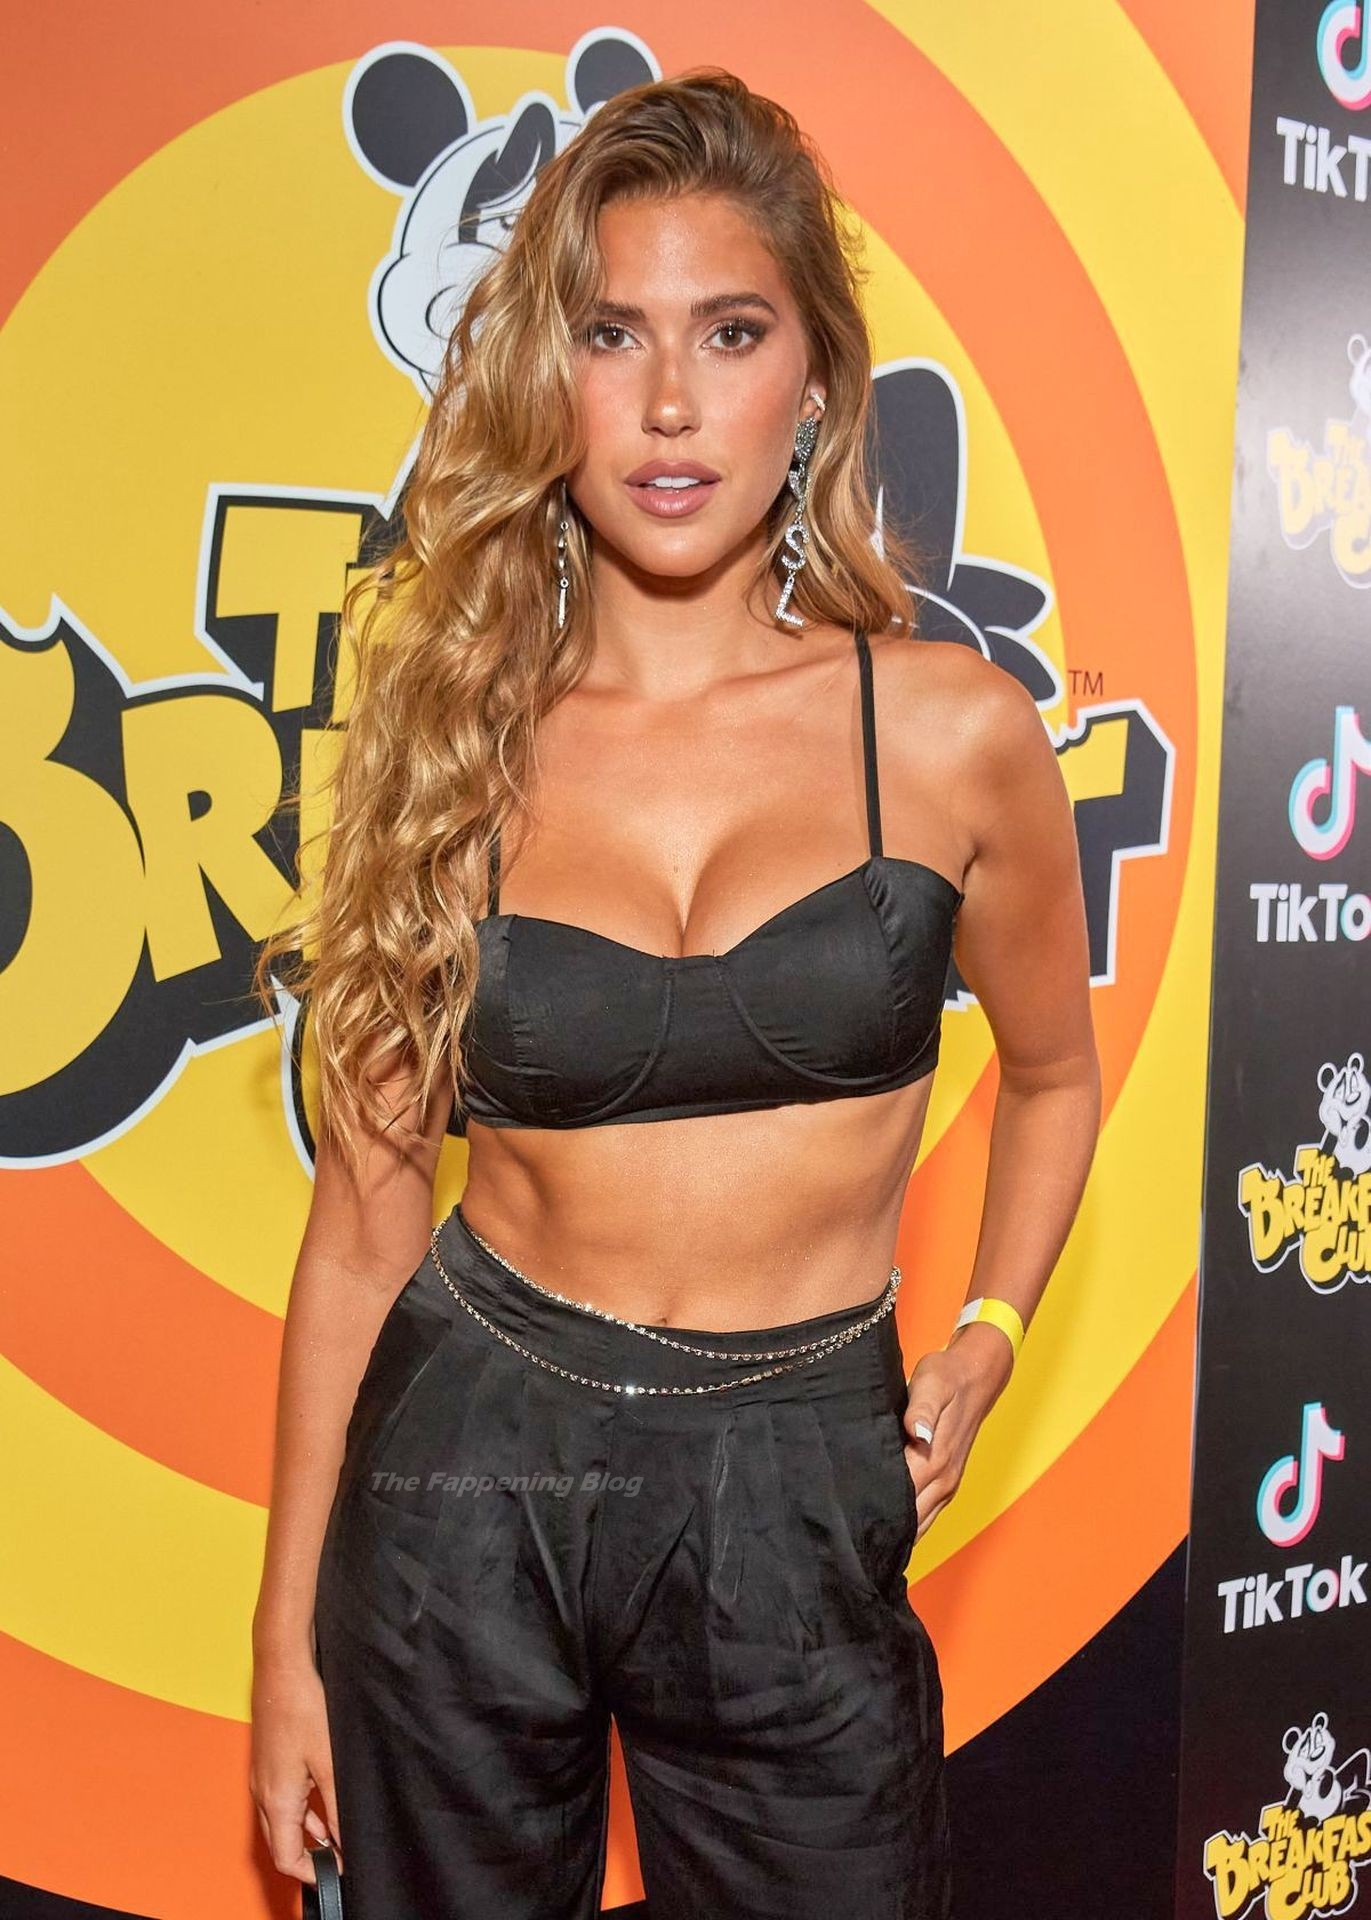 Kara-Del-Toro-Stunning-Big-Boobs-81-thefappeningblog.com_.jpg